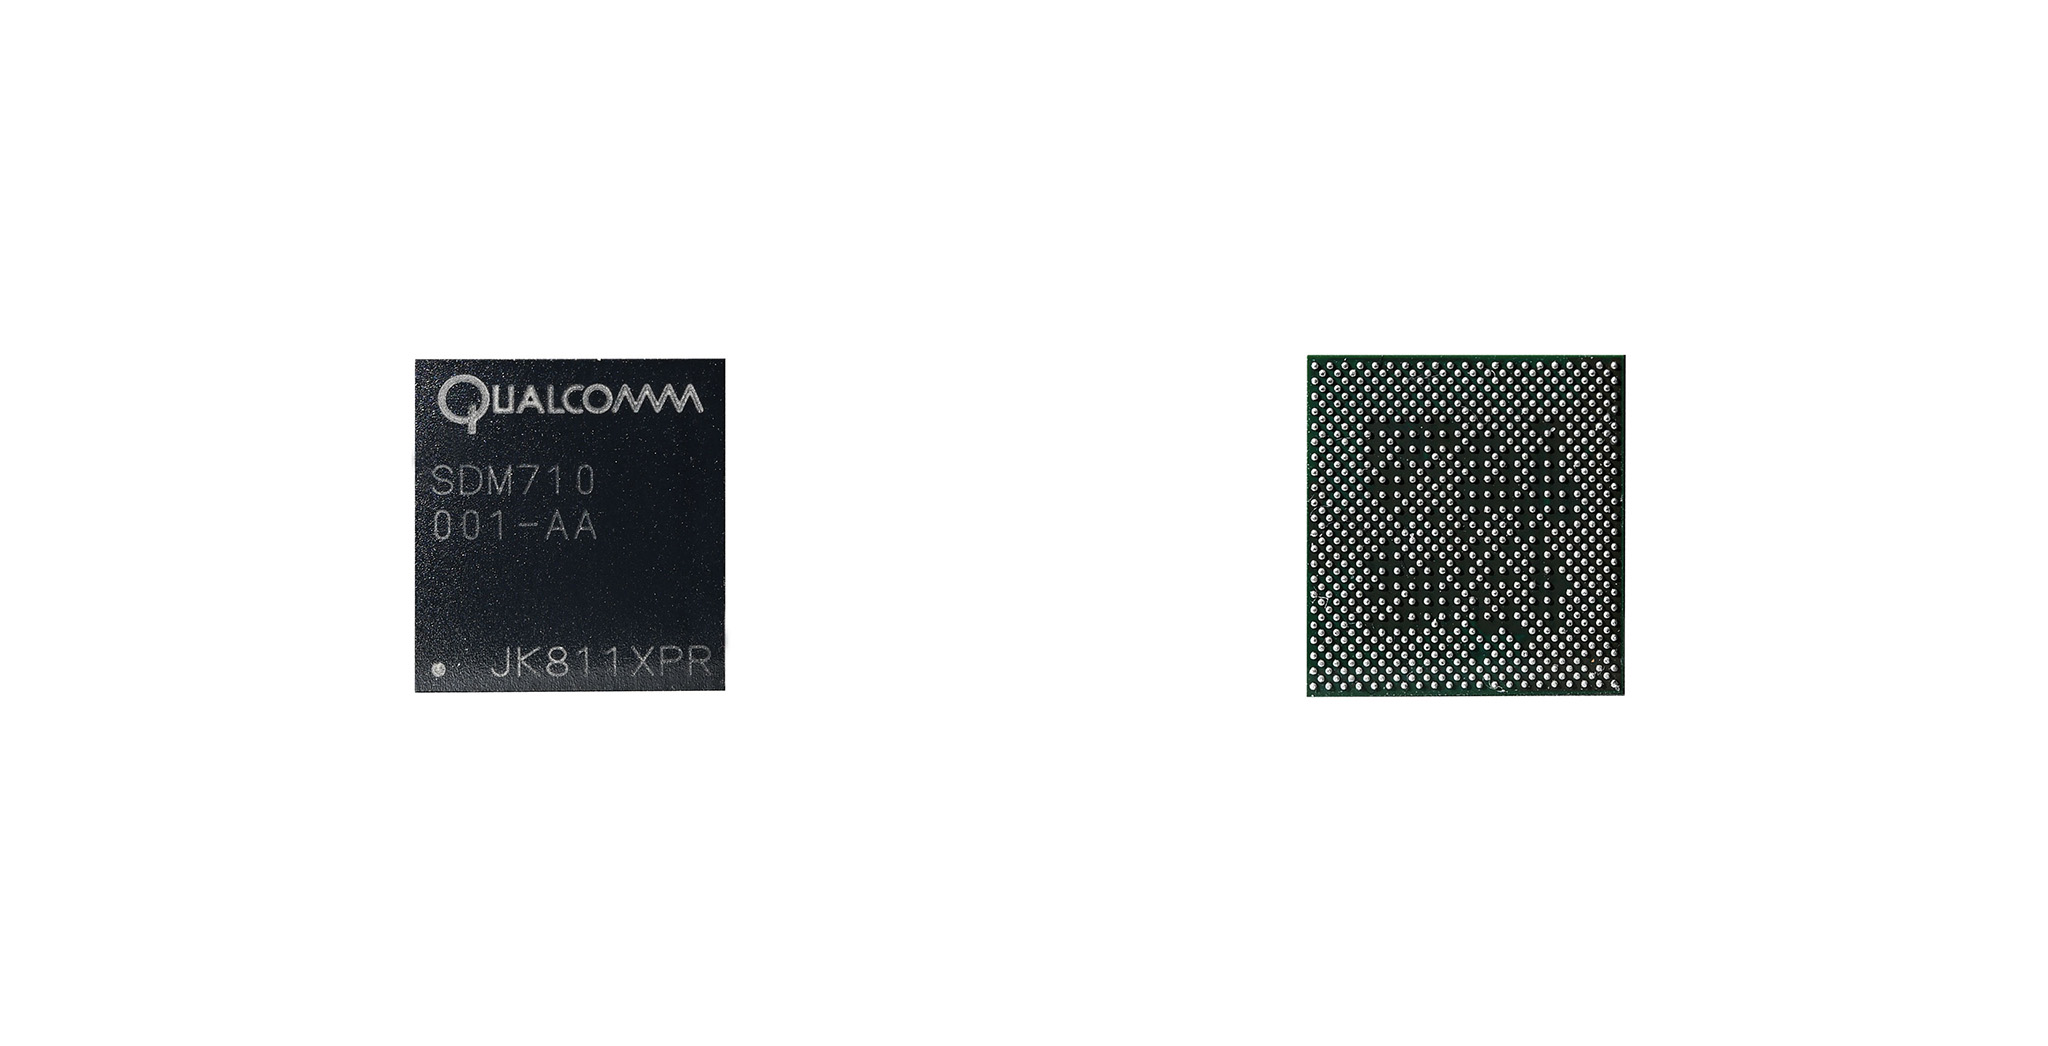 Qualcomm Snapdragon 710.jpg